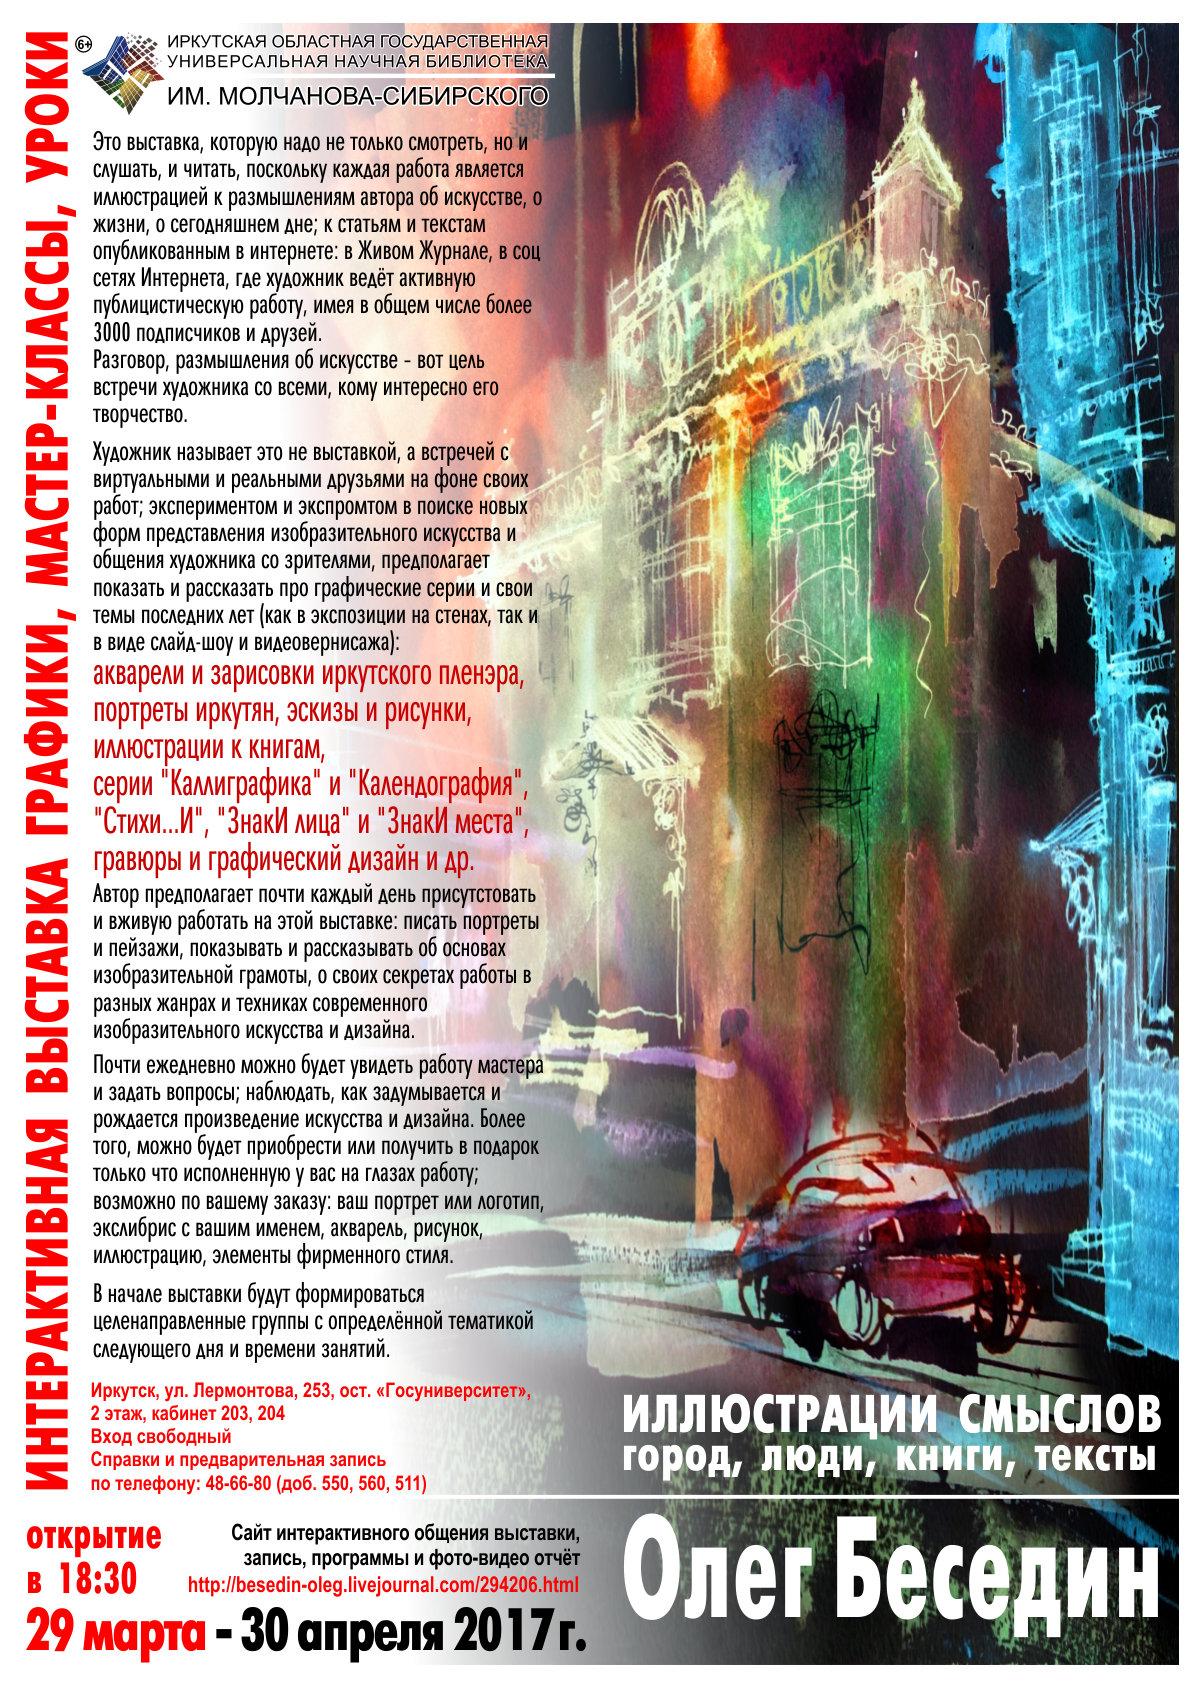 © Беседин Выст АФИША Буклет 1 200.jpg